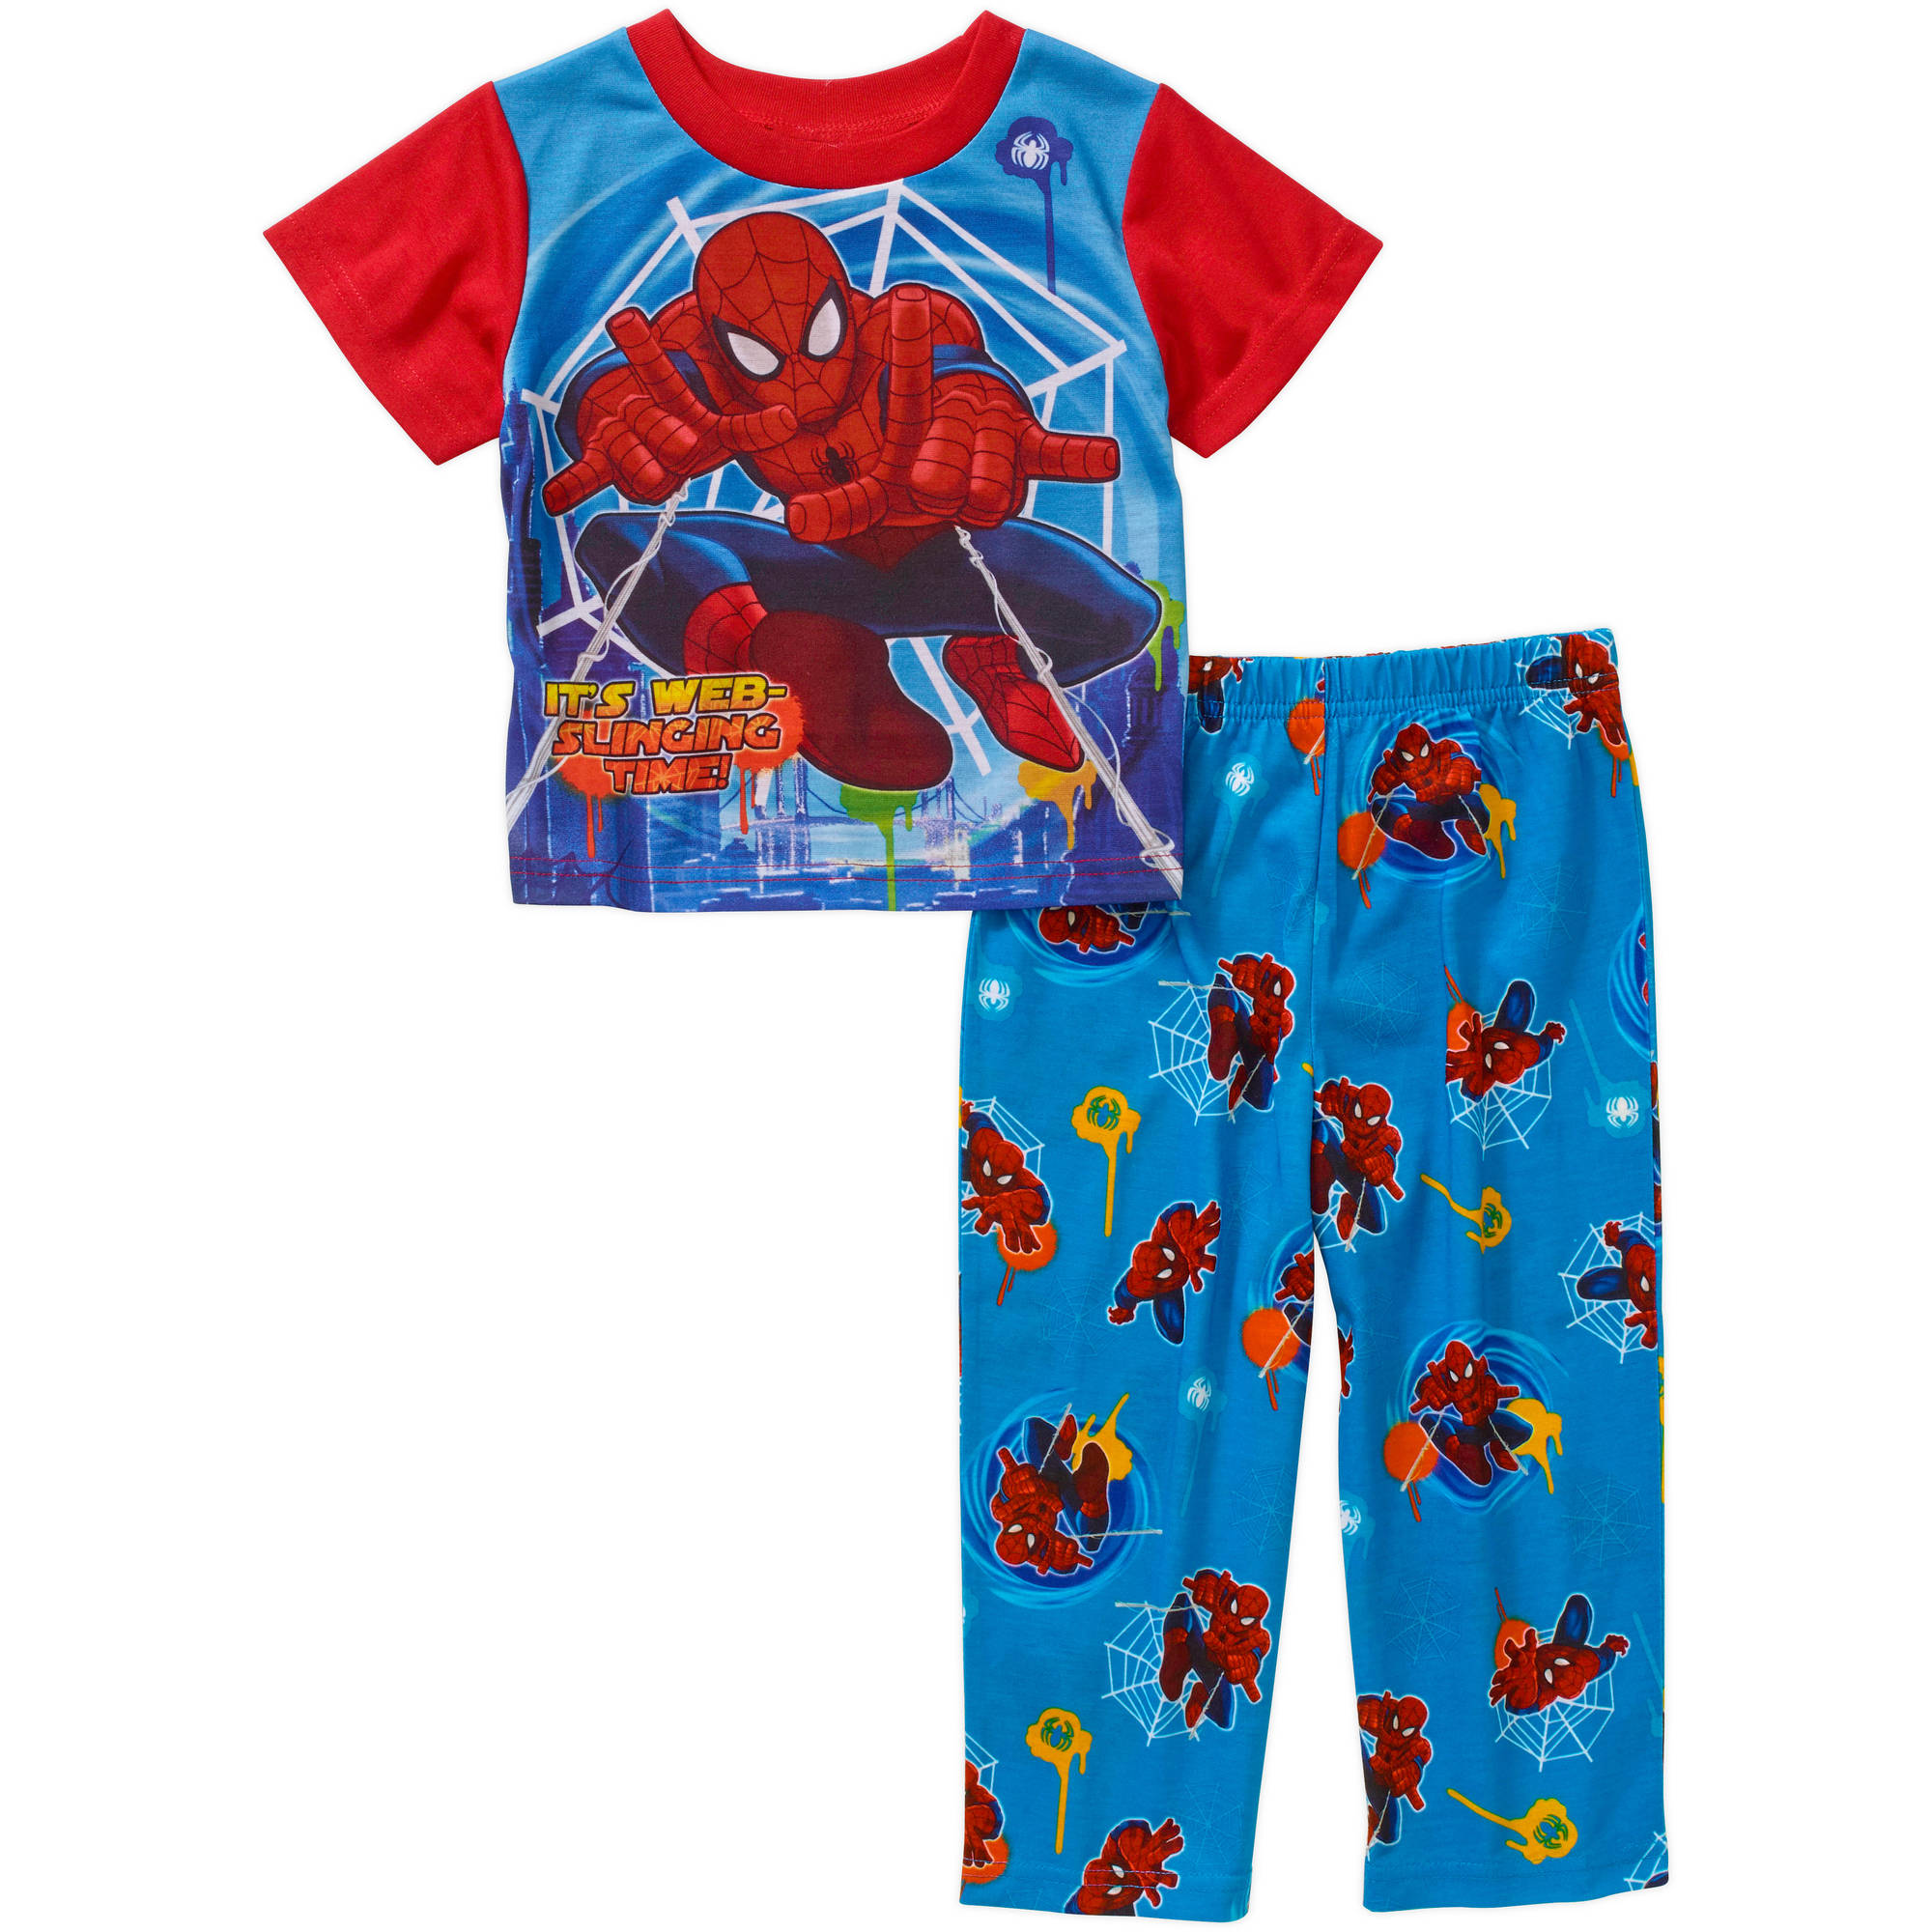 Spider-Man Toddler Boy Short Sleeve Pajama Sleepwear Set